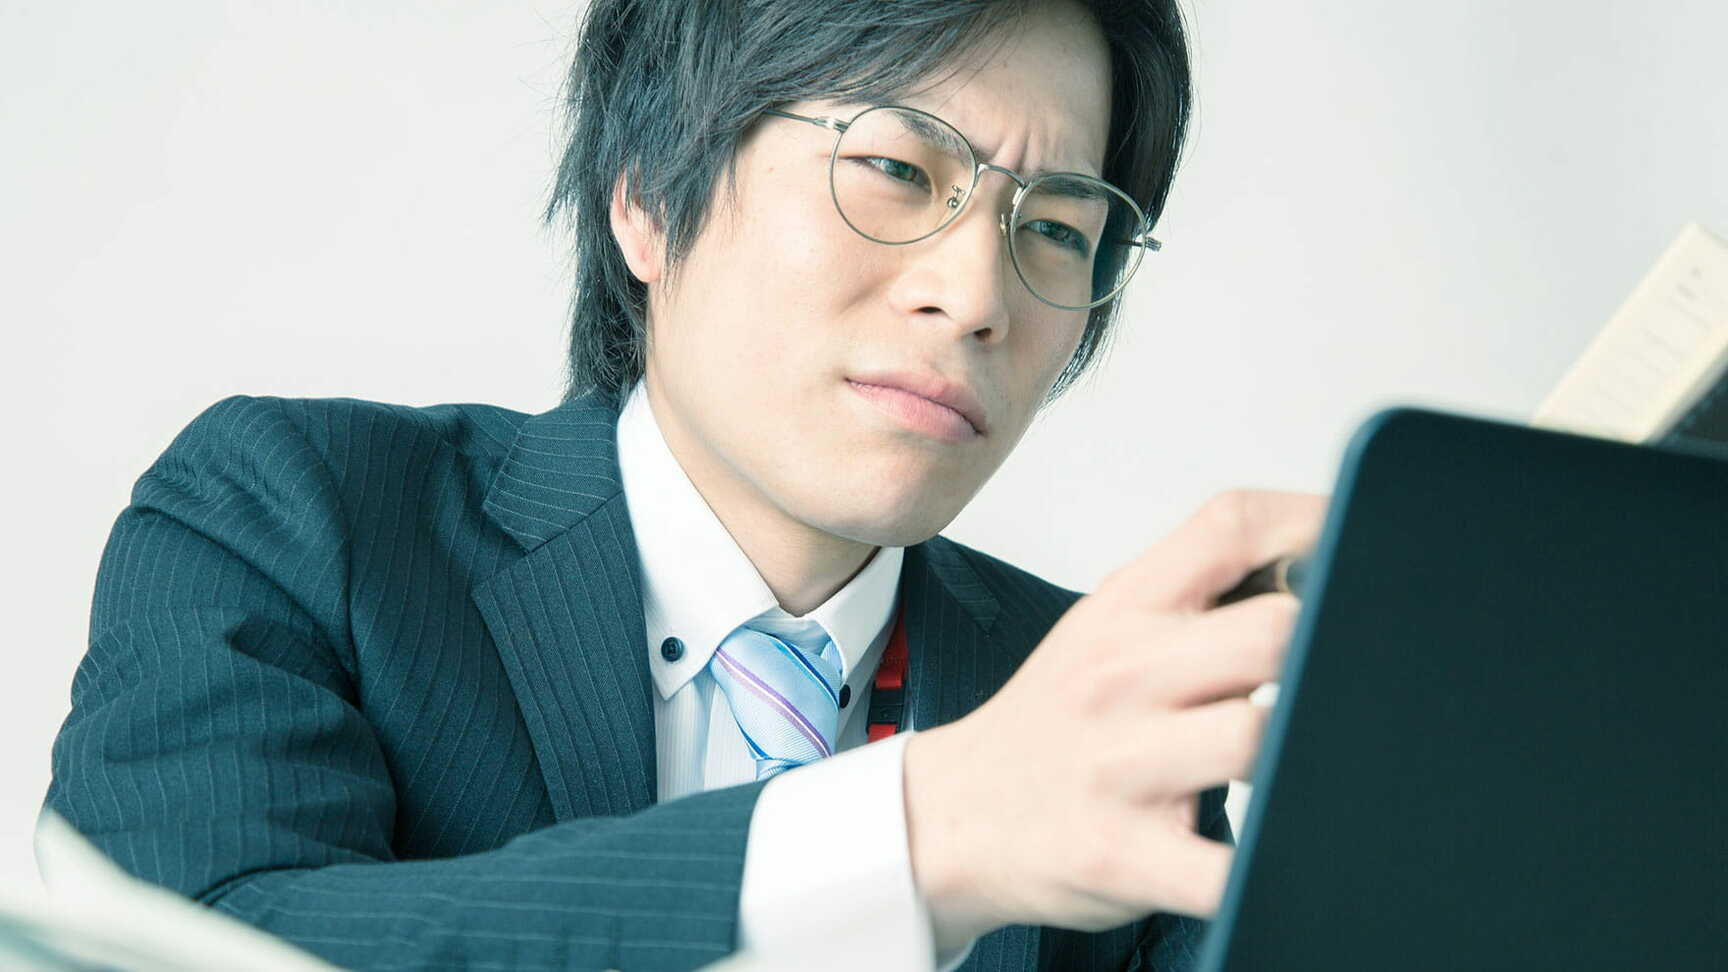 GIGAスクール「ICT化の波」乗れない先生の処方箋